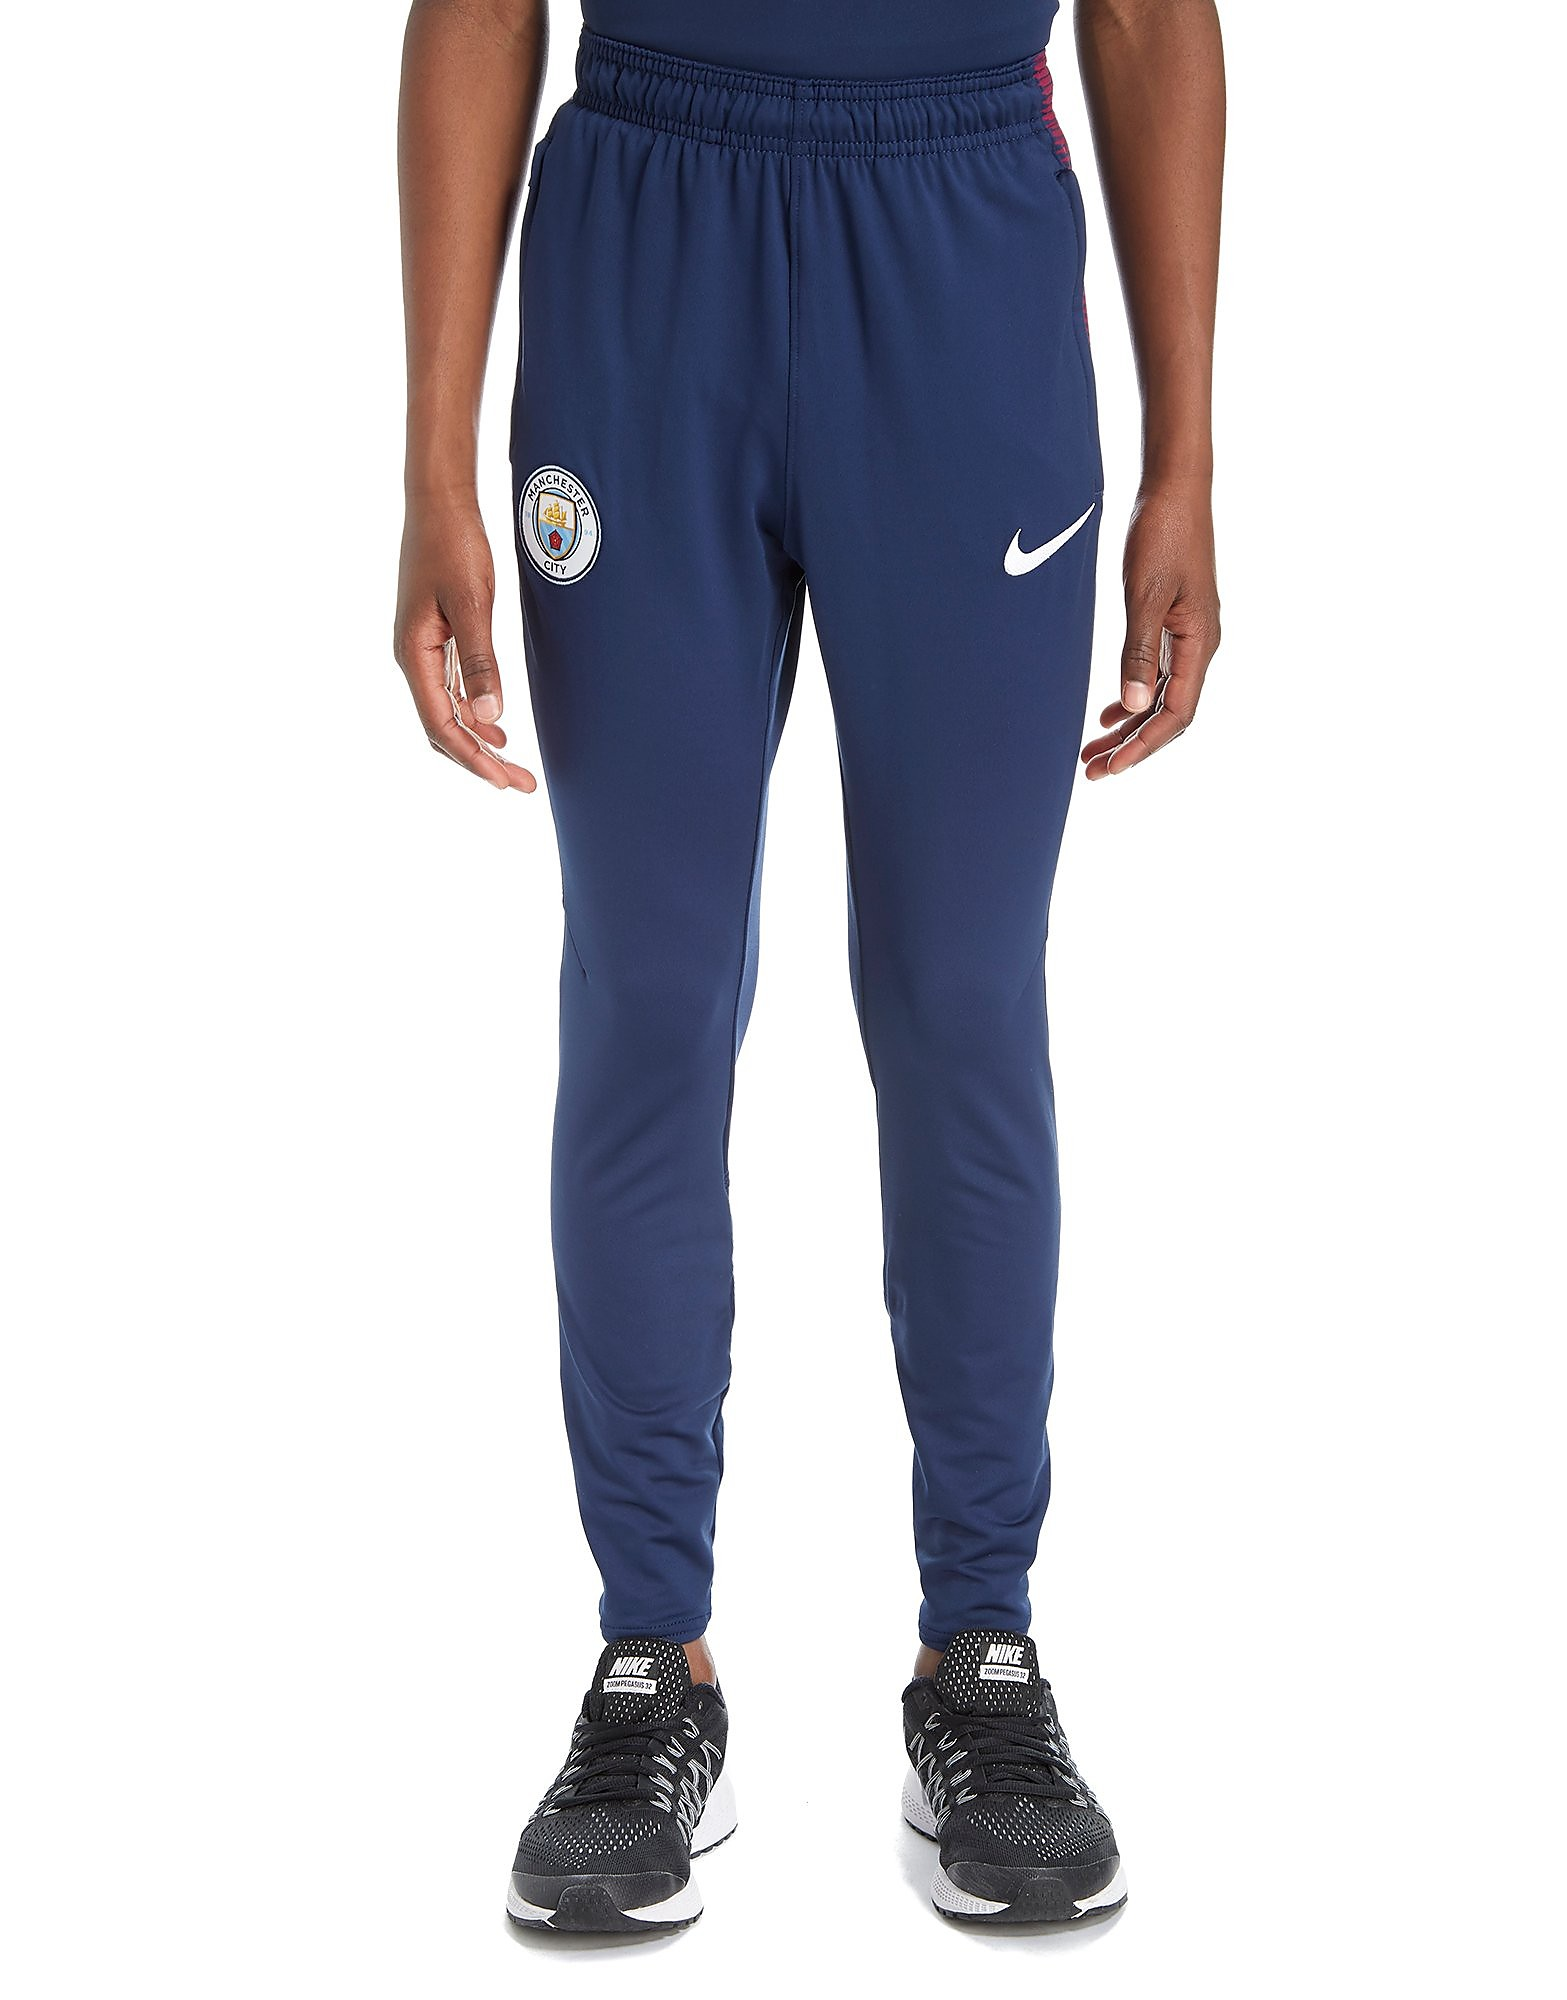 Nike pantalón de chándal Manchester City FC 2017/18 Squad júnior